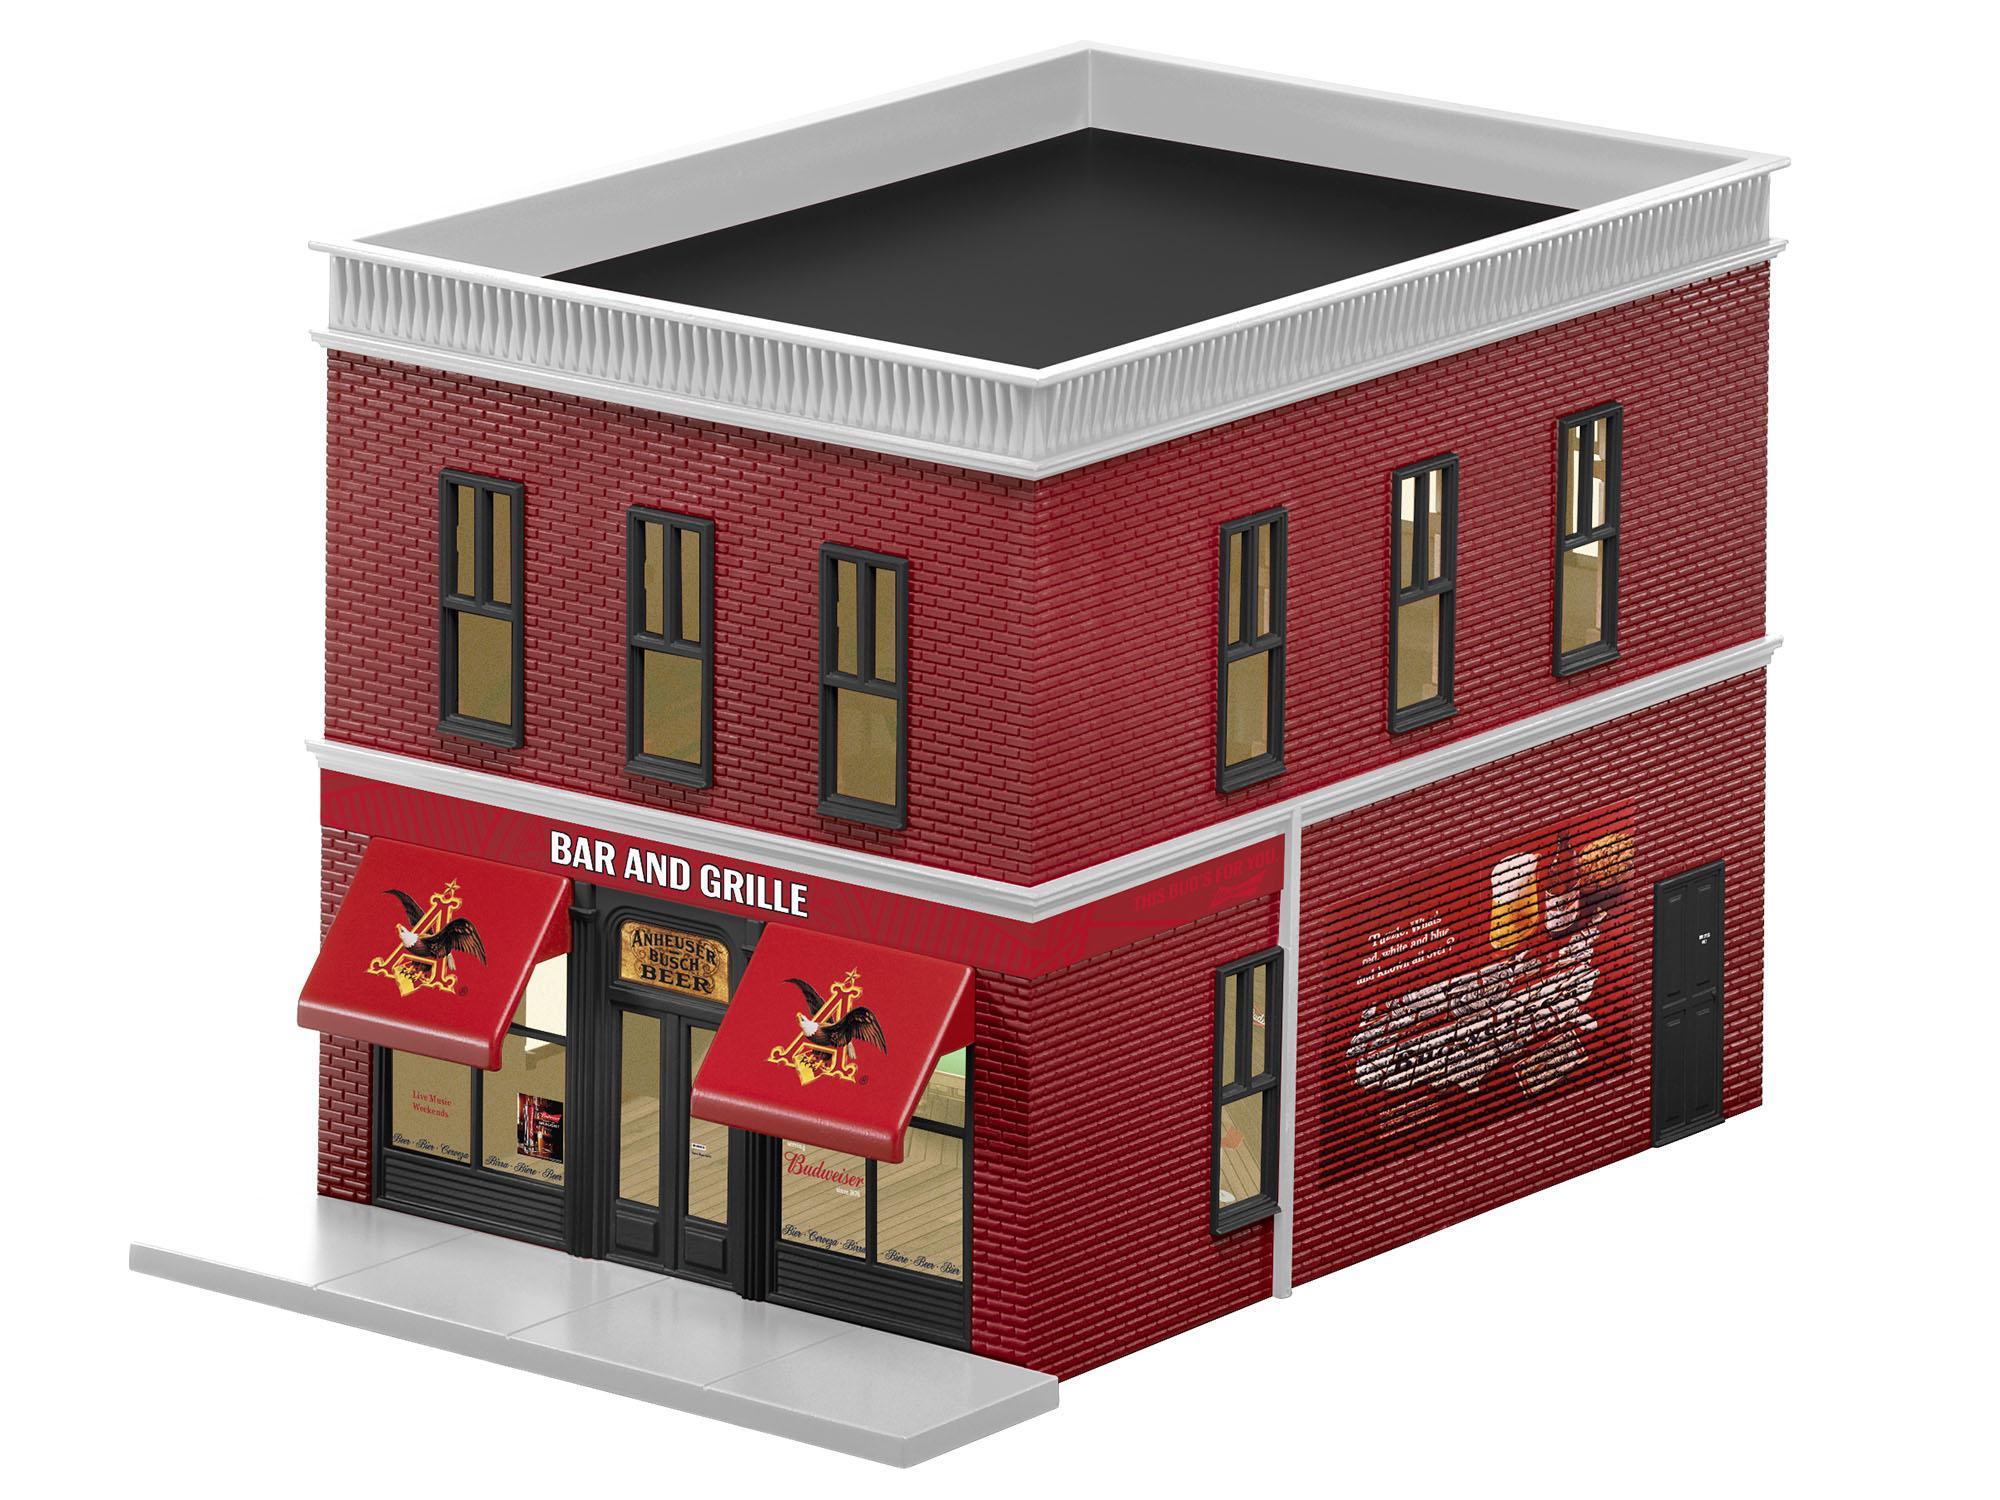 LNL684794 Lionel O Budweiser Bar & Grille